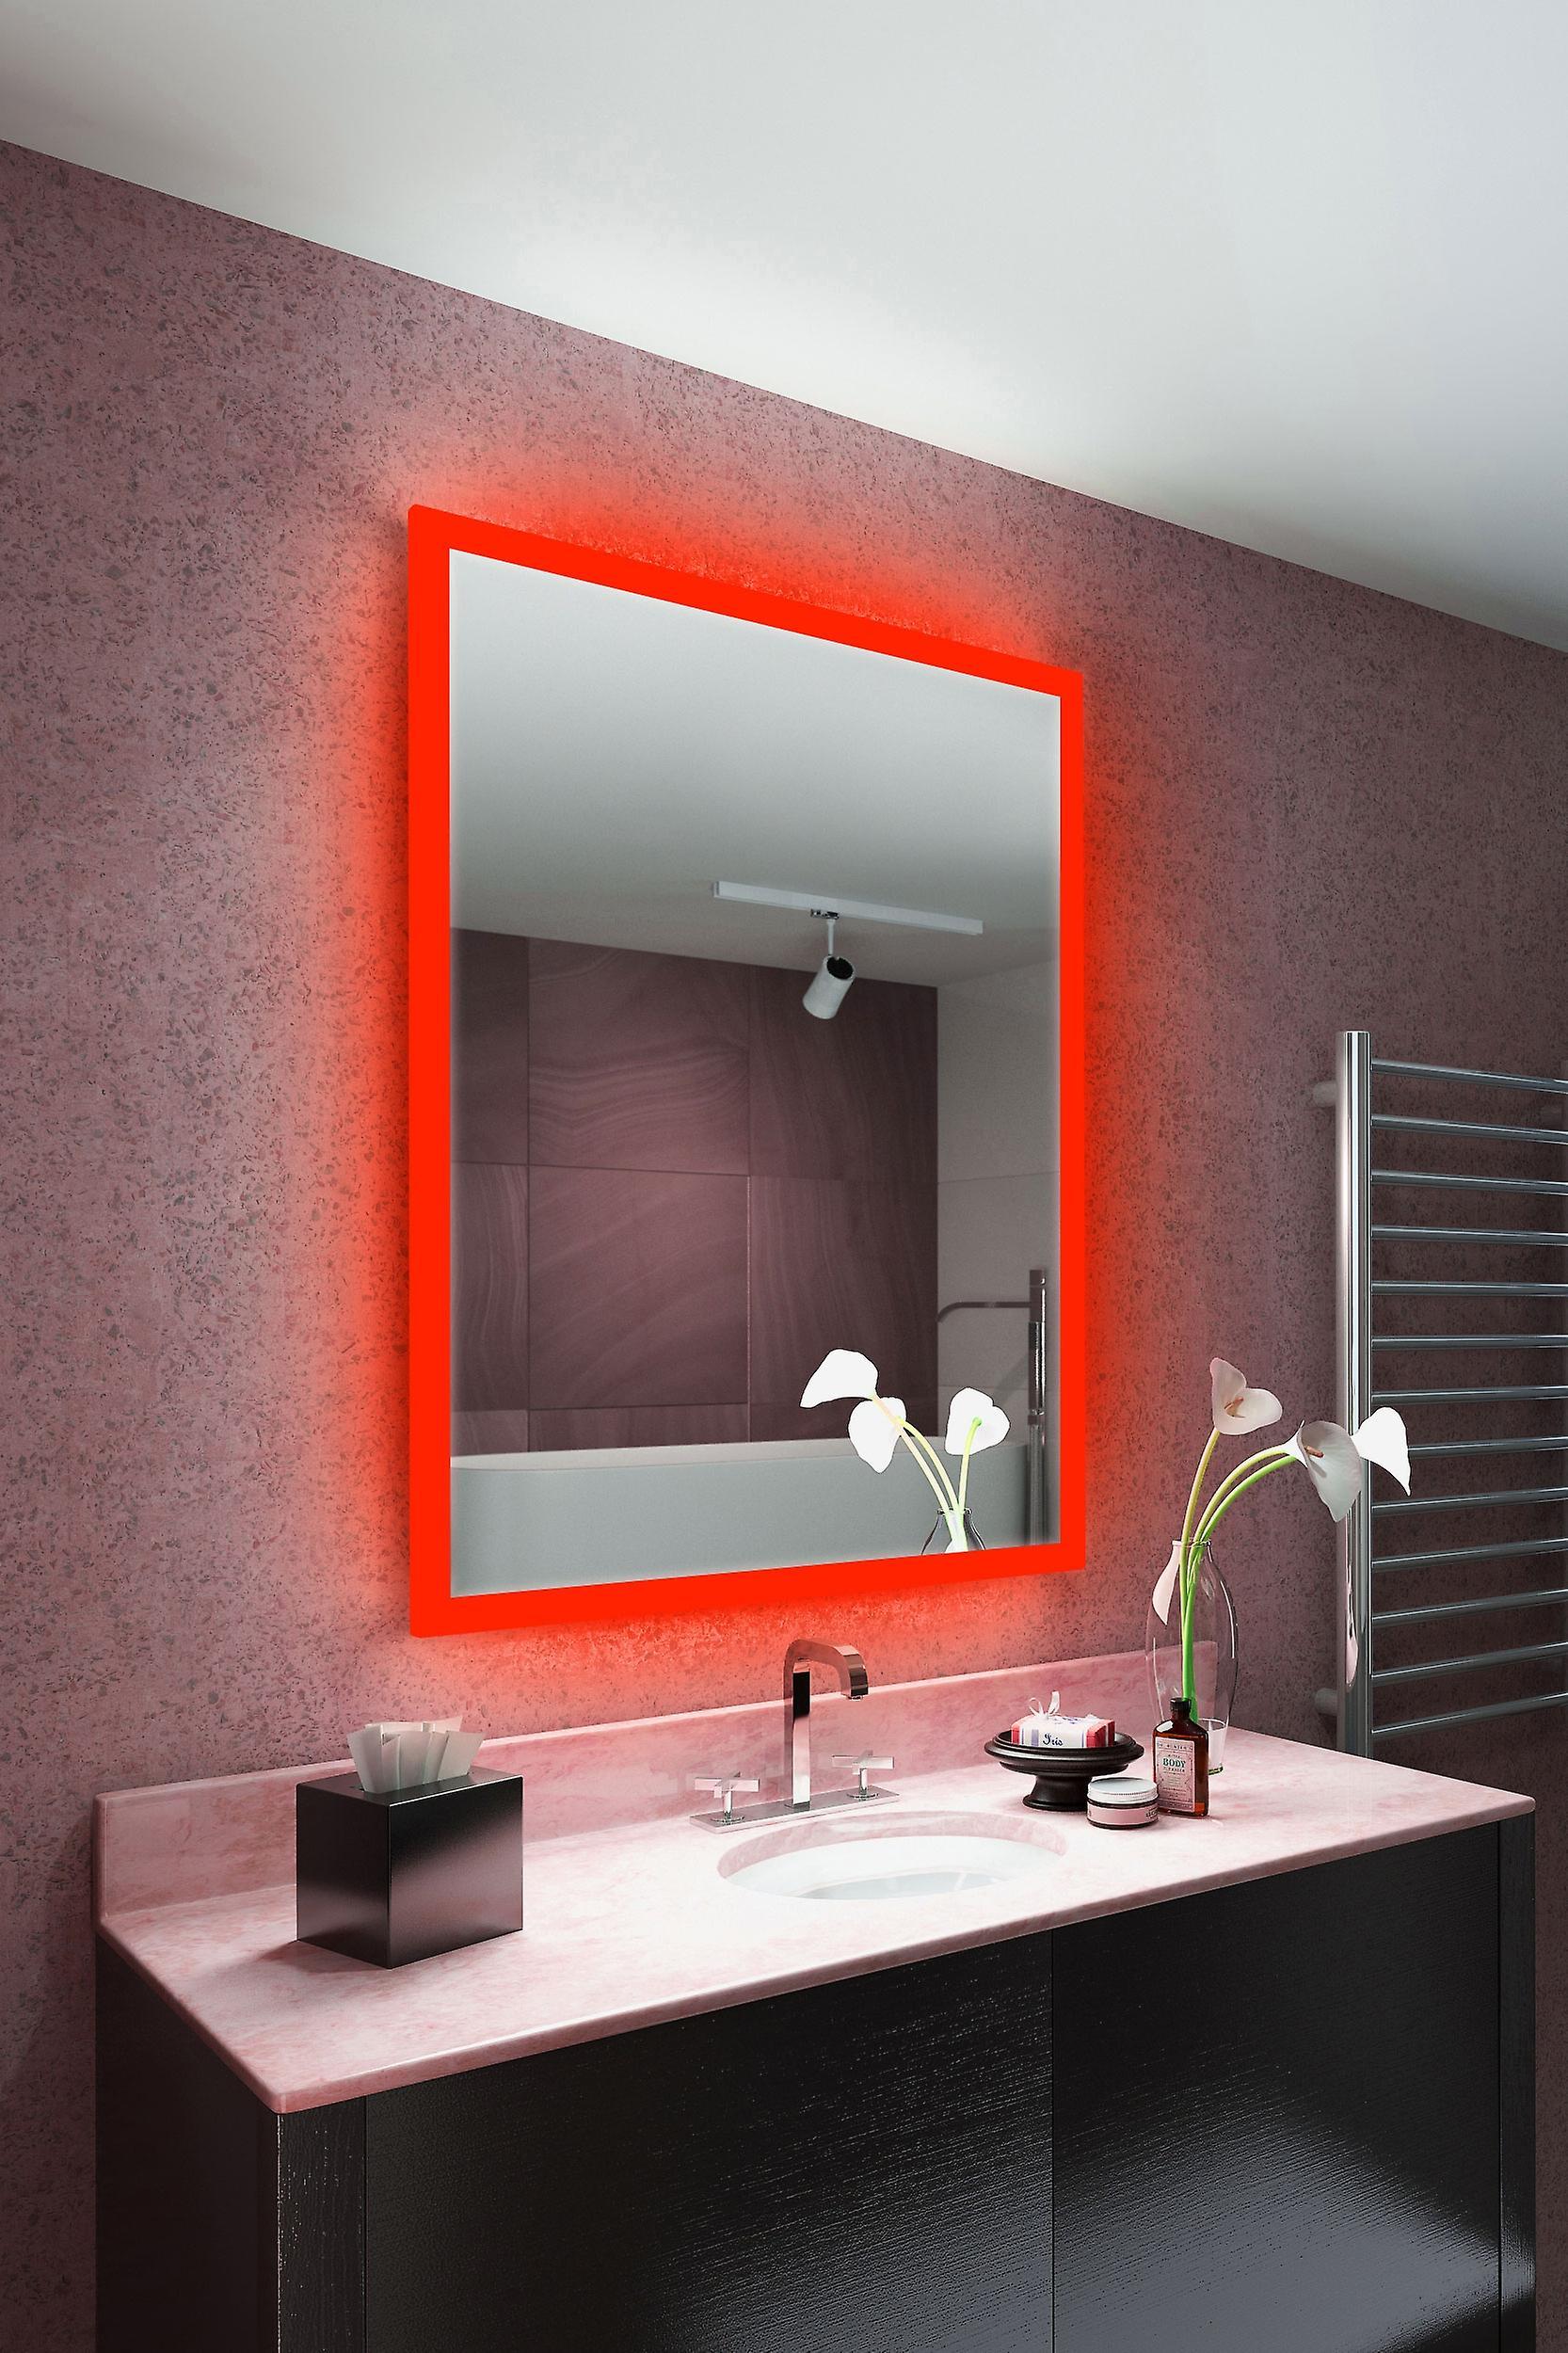 RGB Audio Shaver Mirror with Bluetooth Demist Sensor m1418ivrgbaud